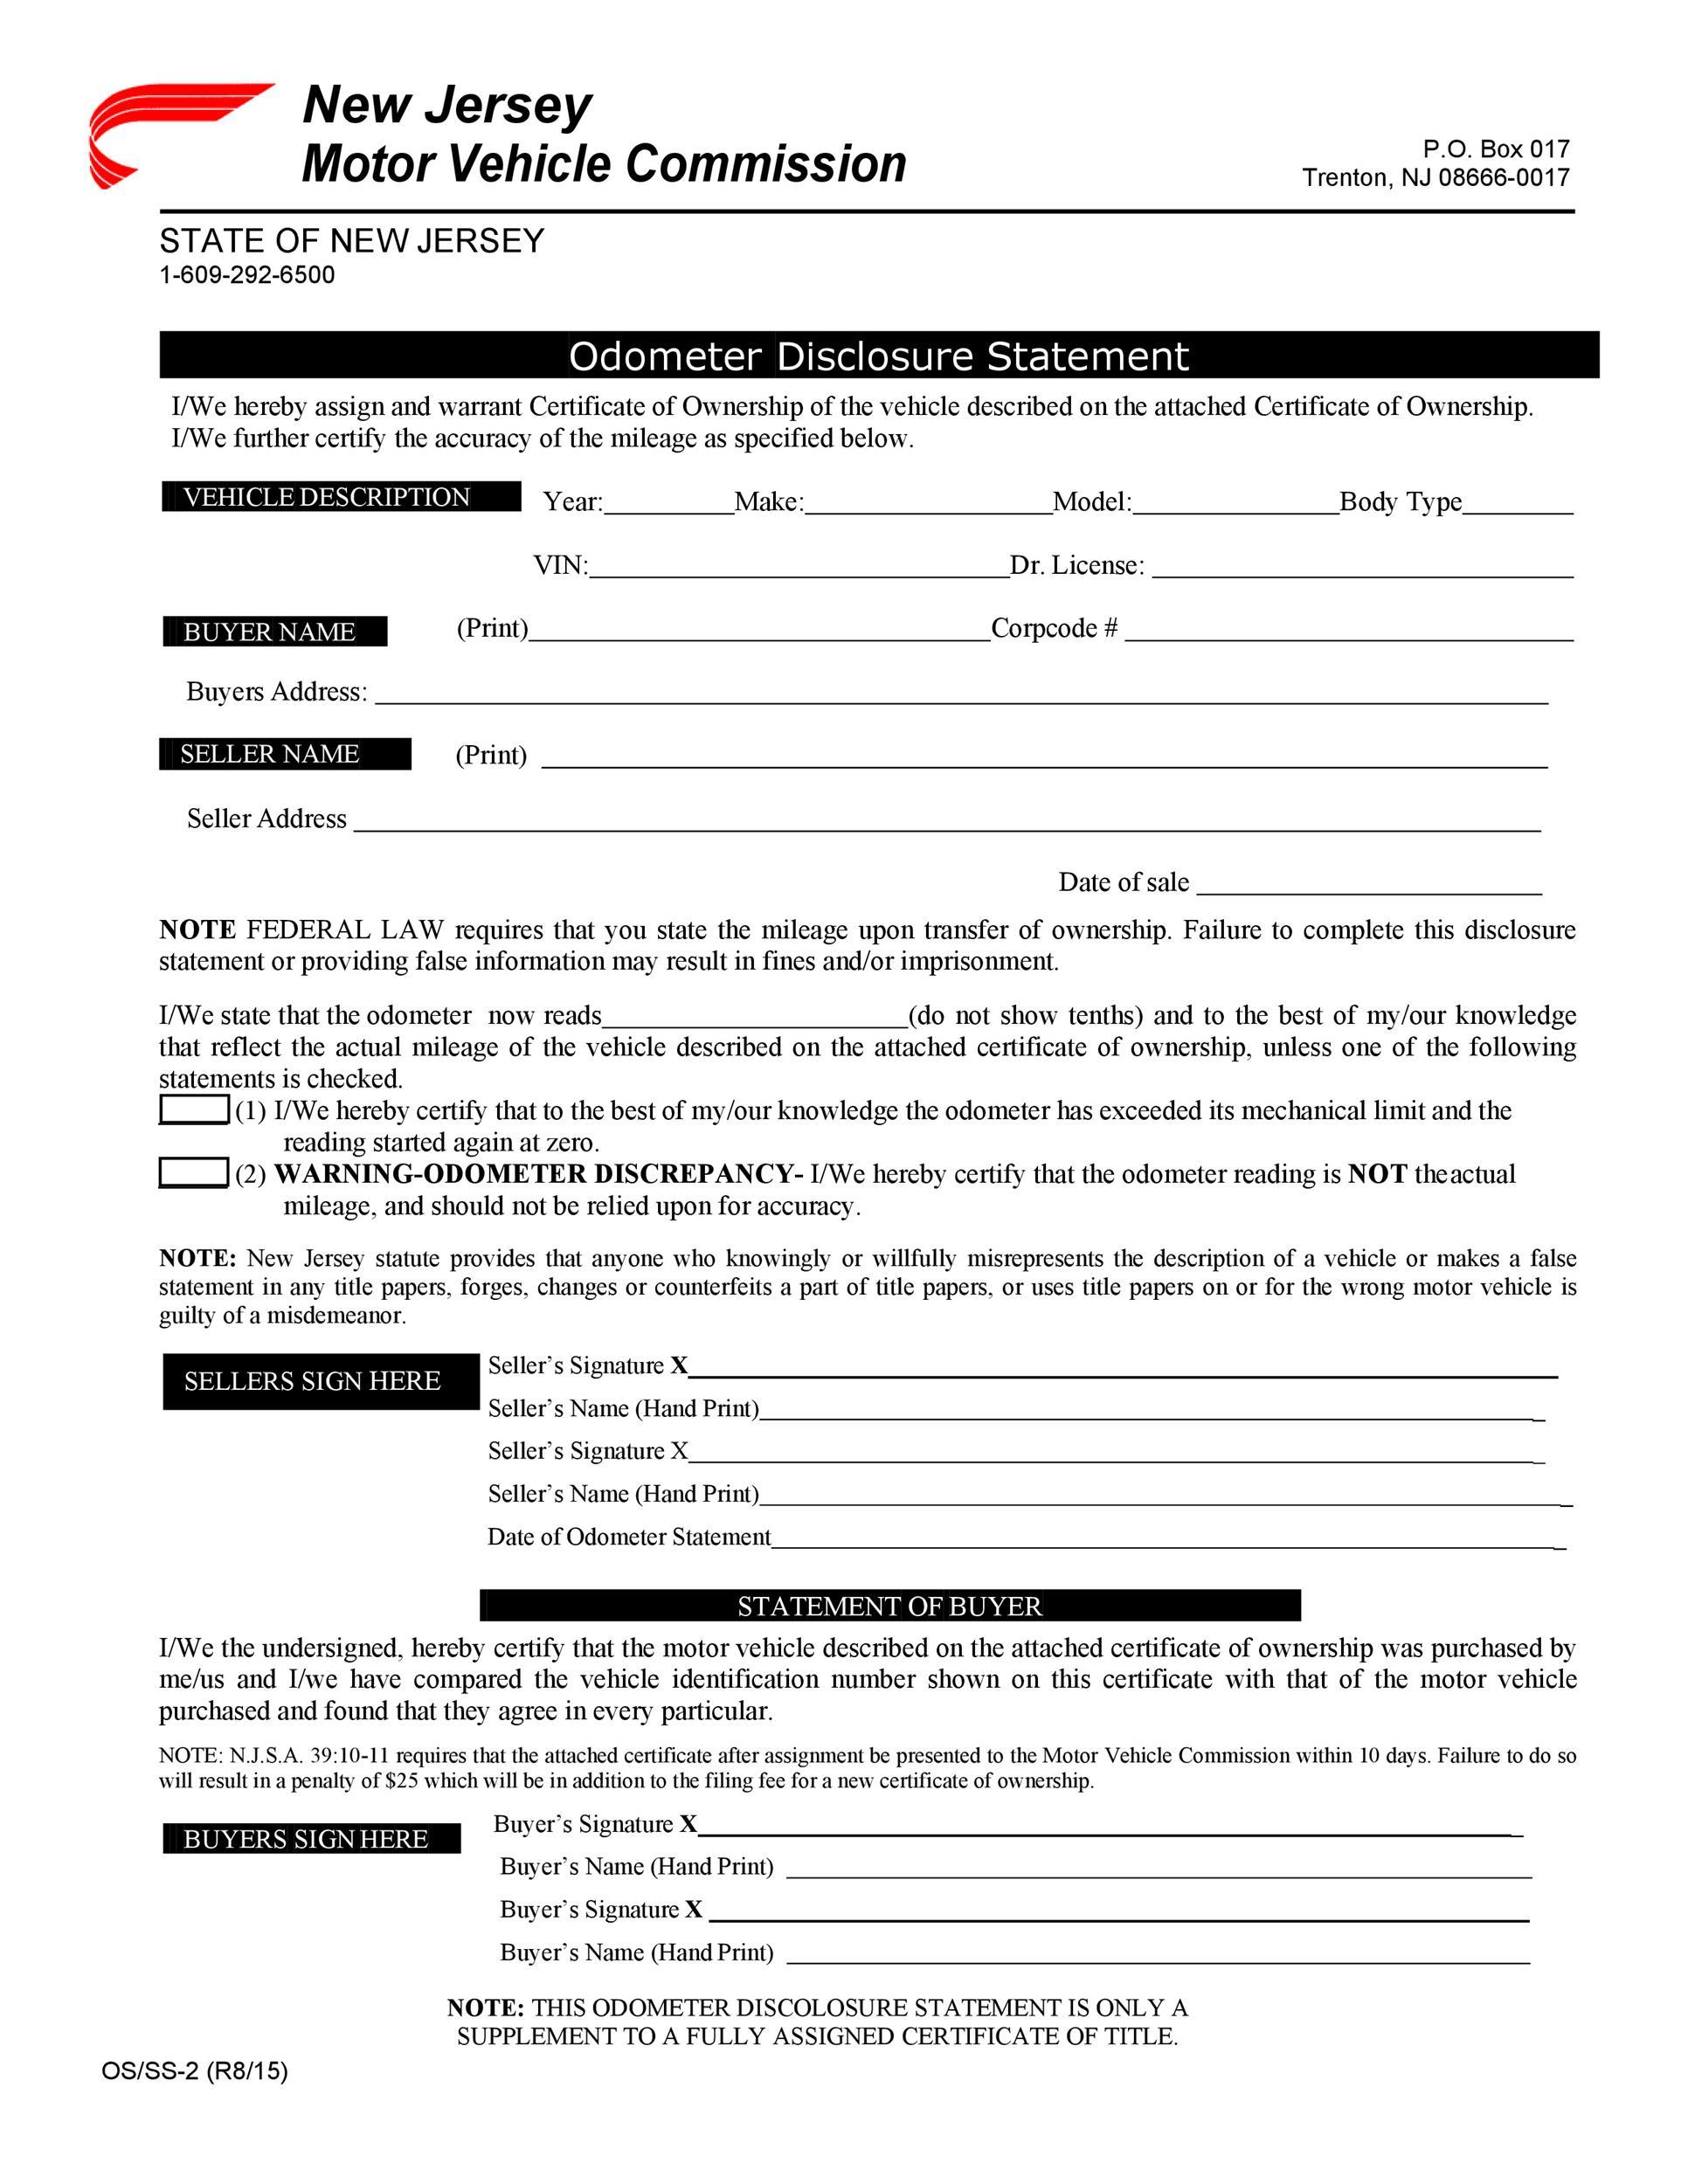 Free odometer disclosure statement 22